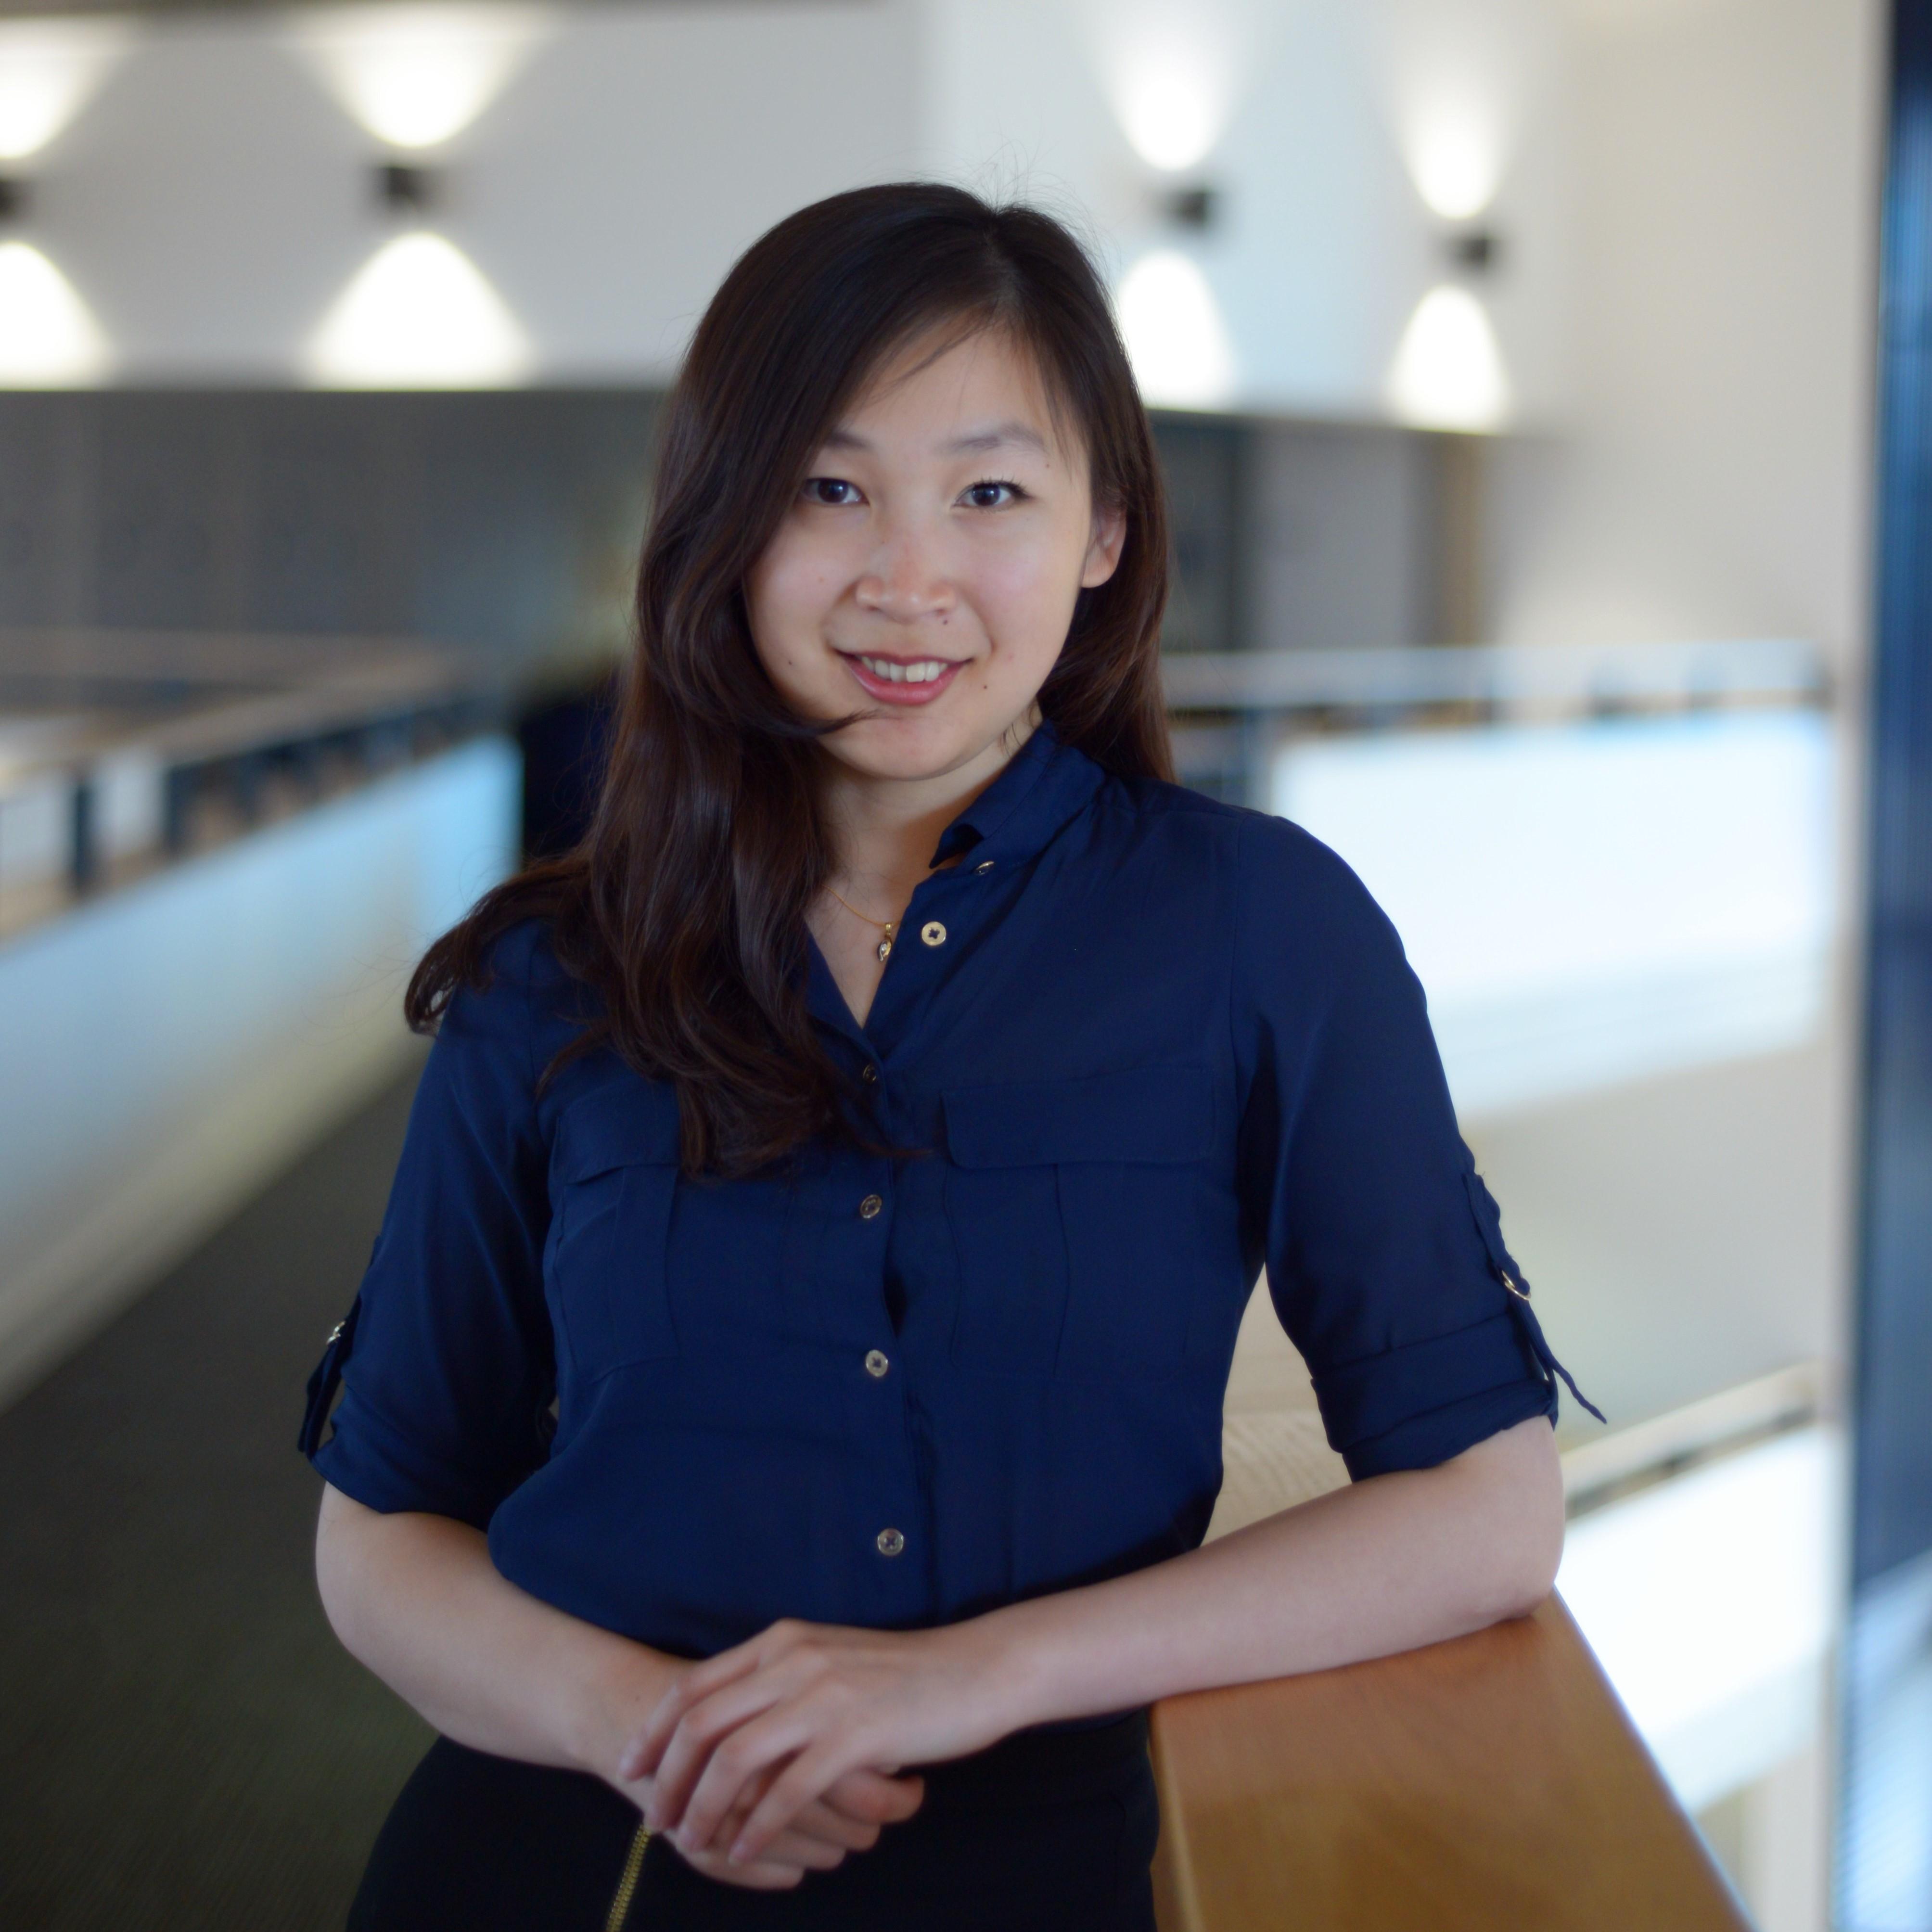 Dr Weizi Li to lead £1 million blood testing research using digital technologies